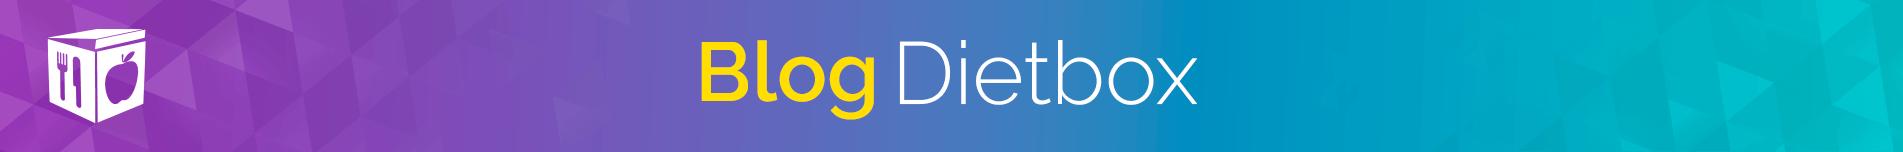 Blog Dietbox